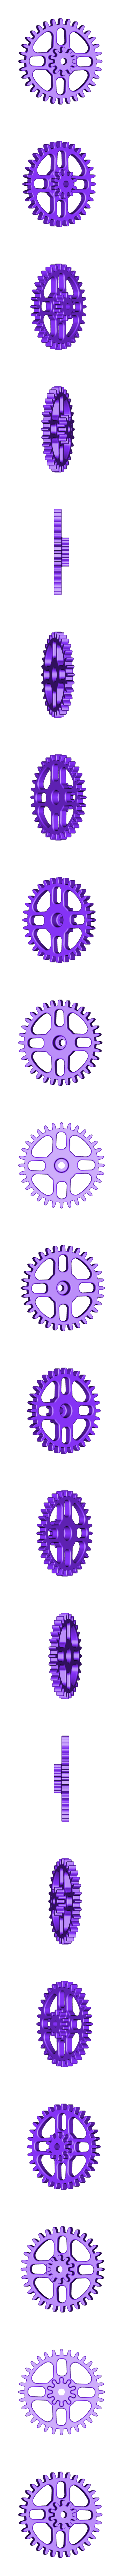 Gear_13_32-10_teeth.STL Download free STL file Automata-4 Ben rides around the clock • 3D printer template, woodenclocks